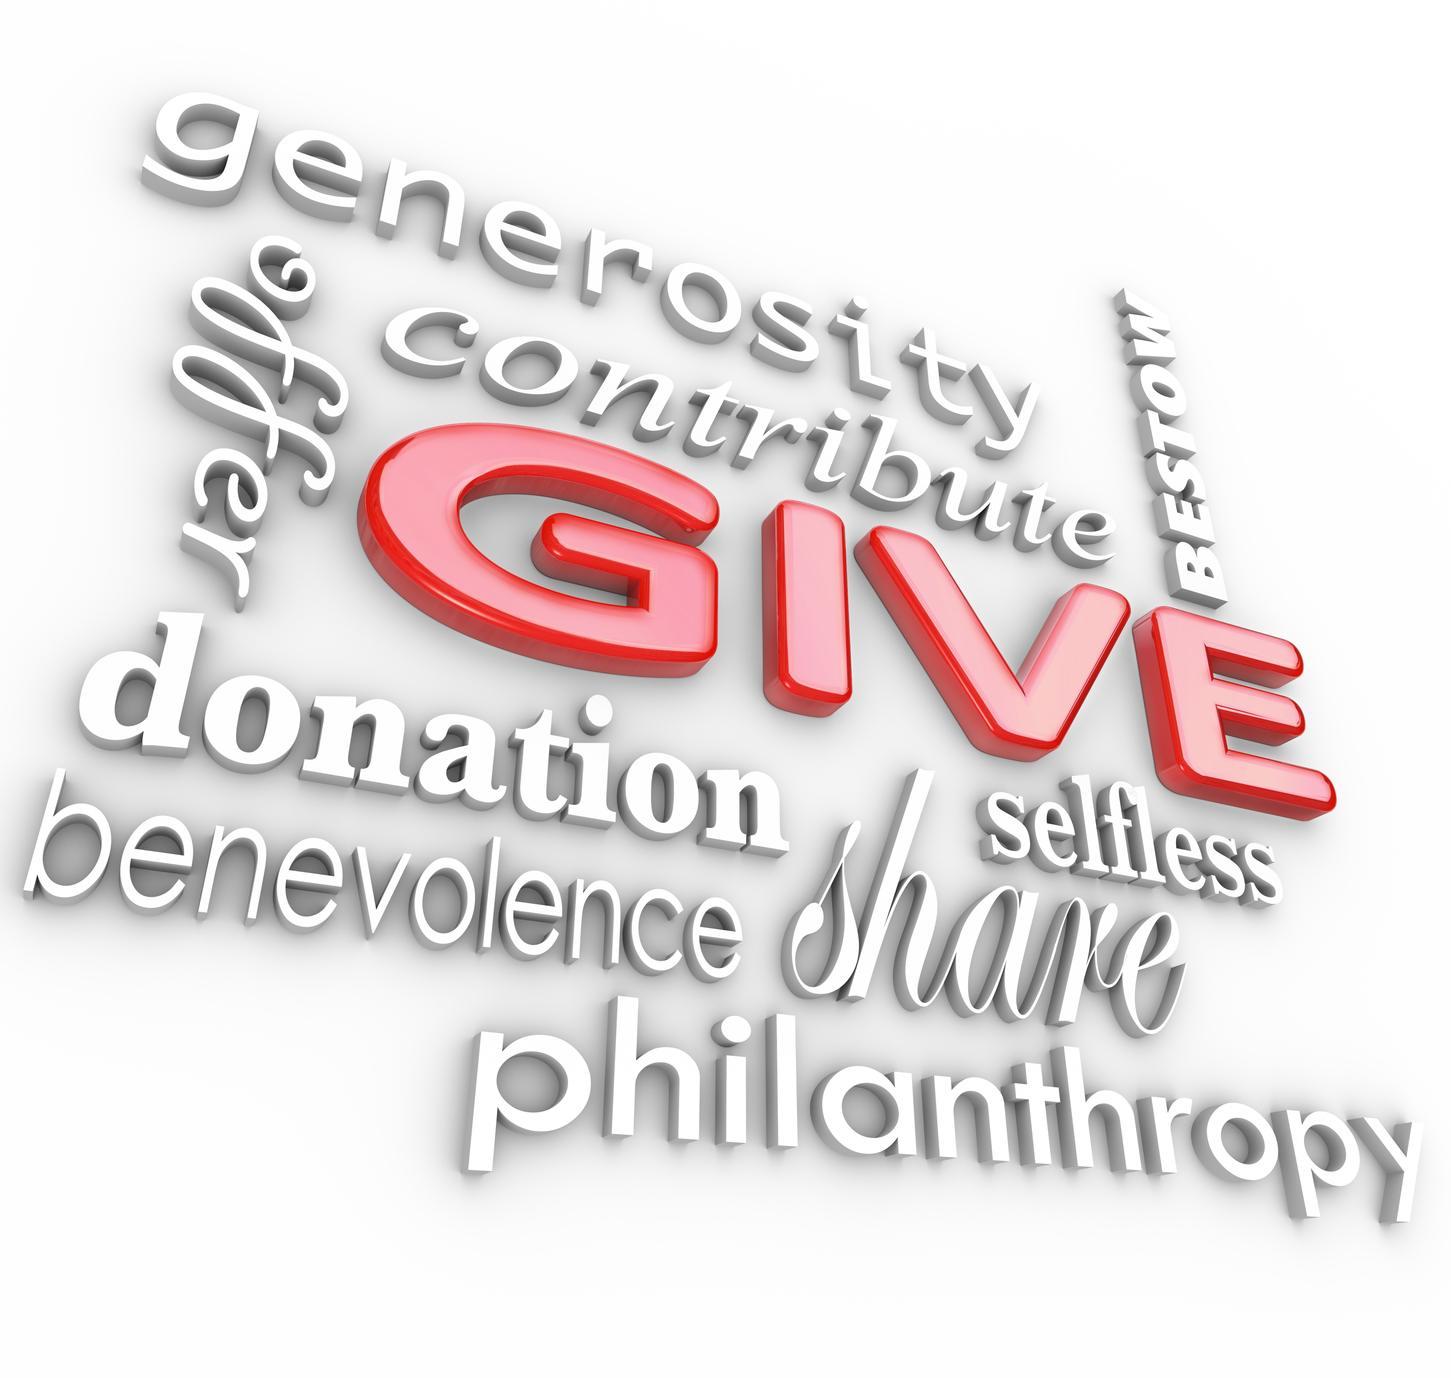 Generosity-01.jpg